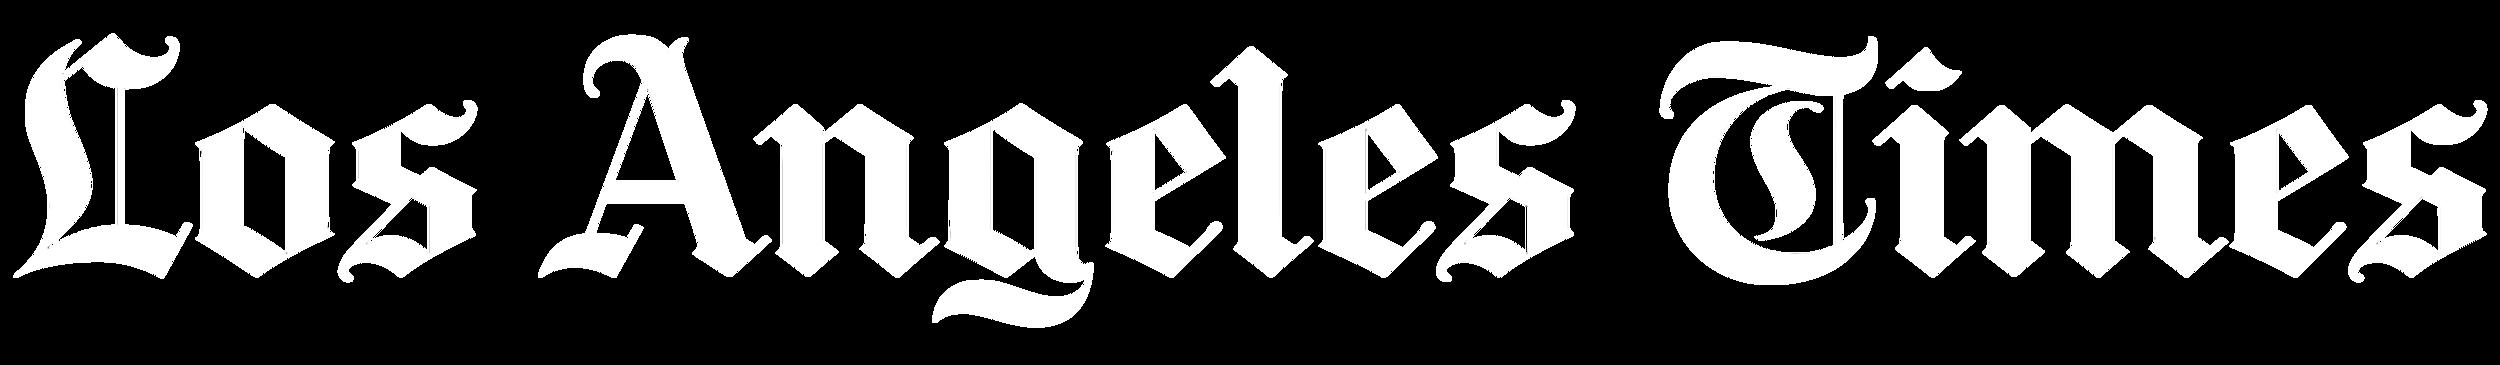 Los_Angeles_Times_logo_black.png